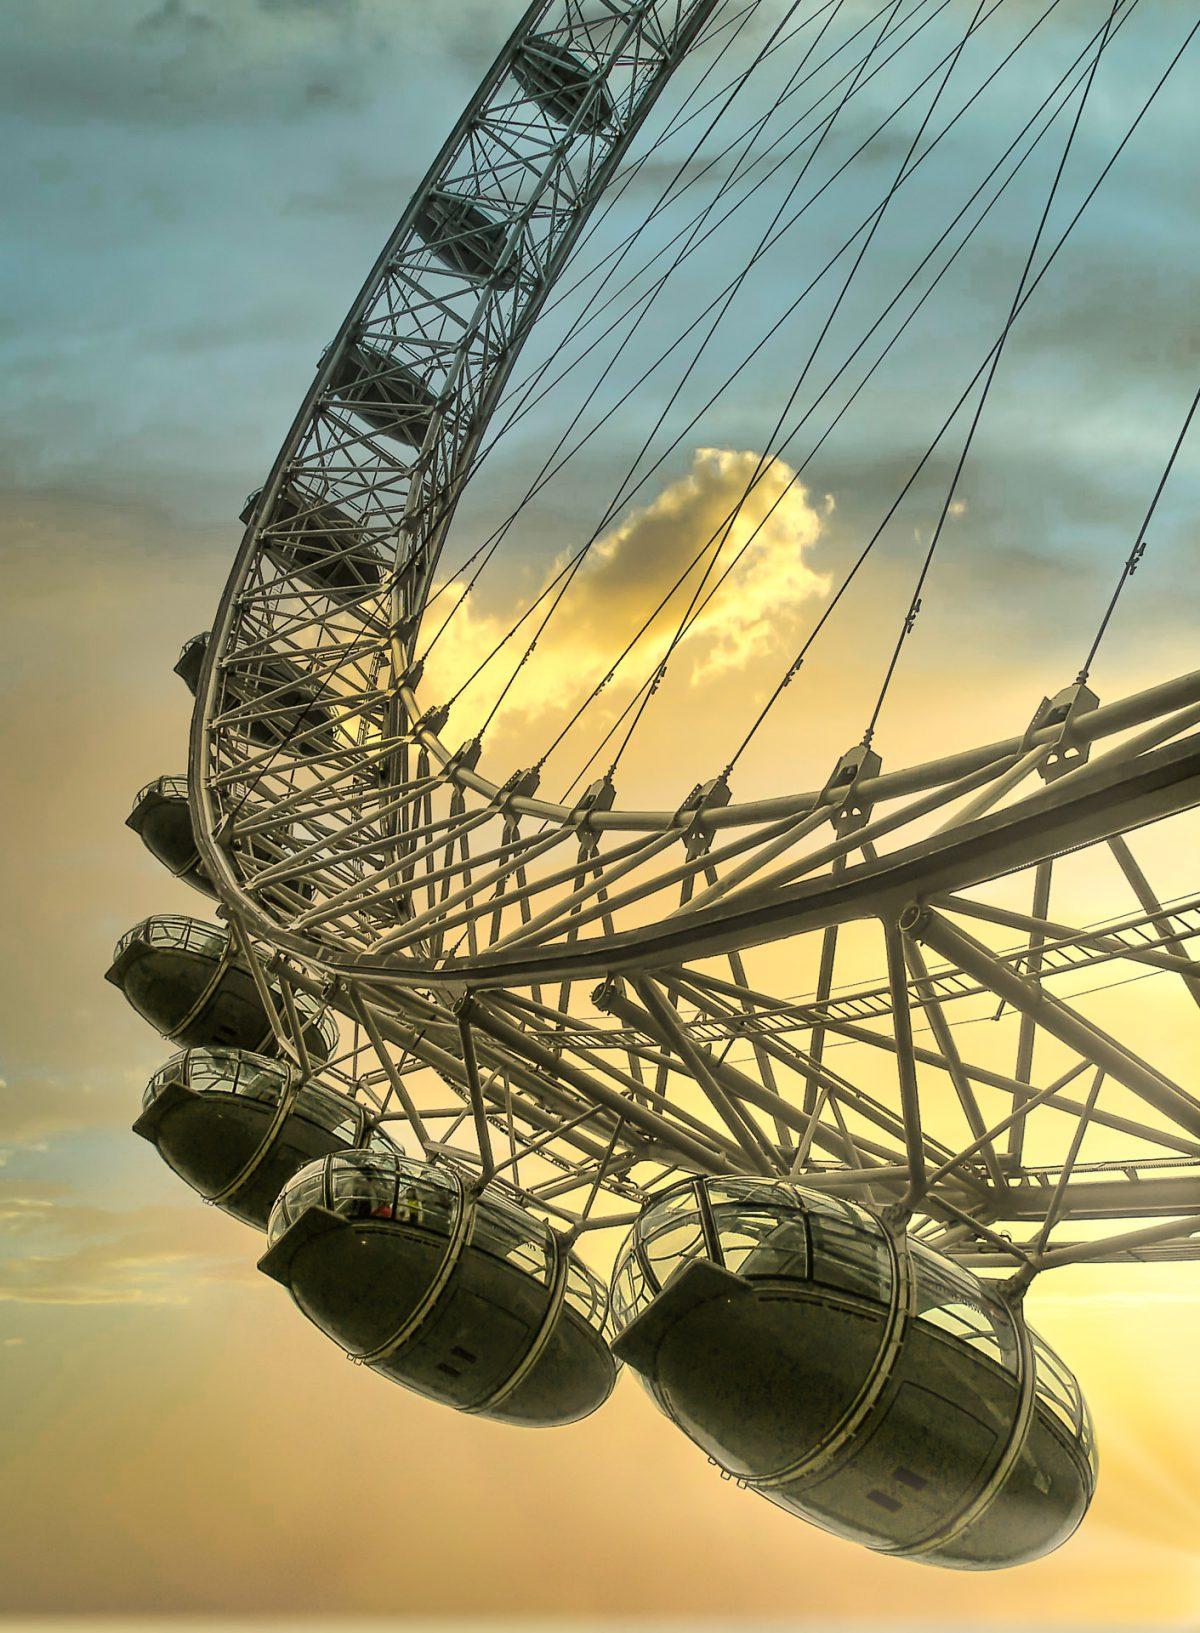 London Eye - (c) Eric immerheiser